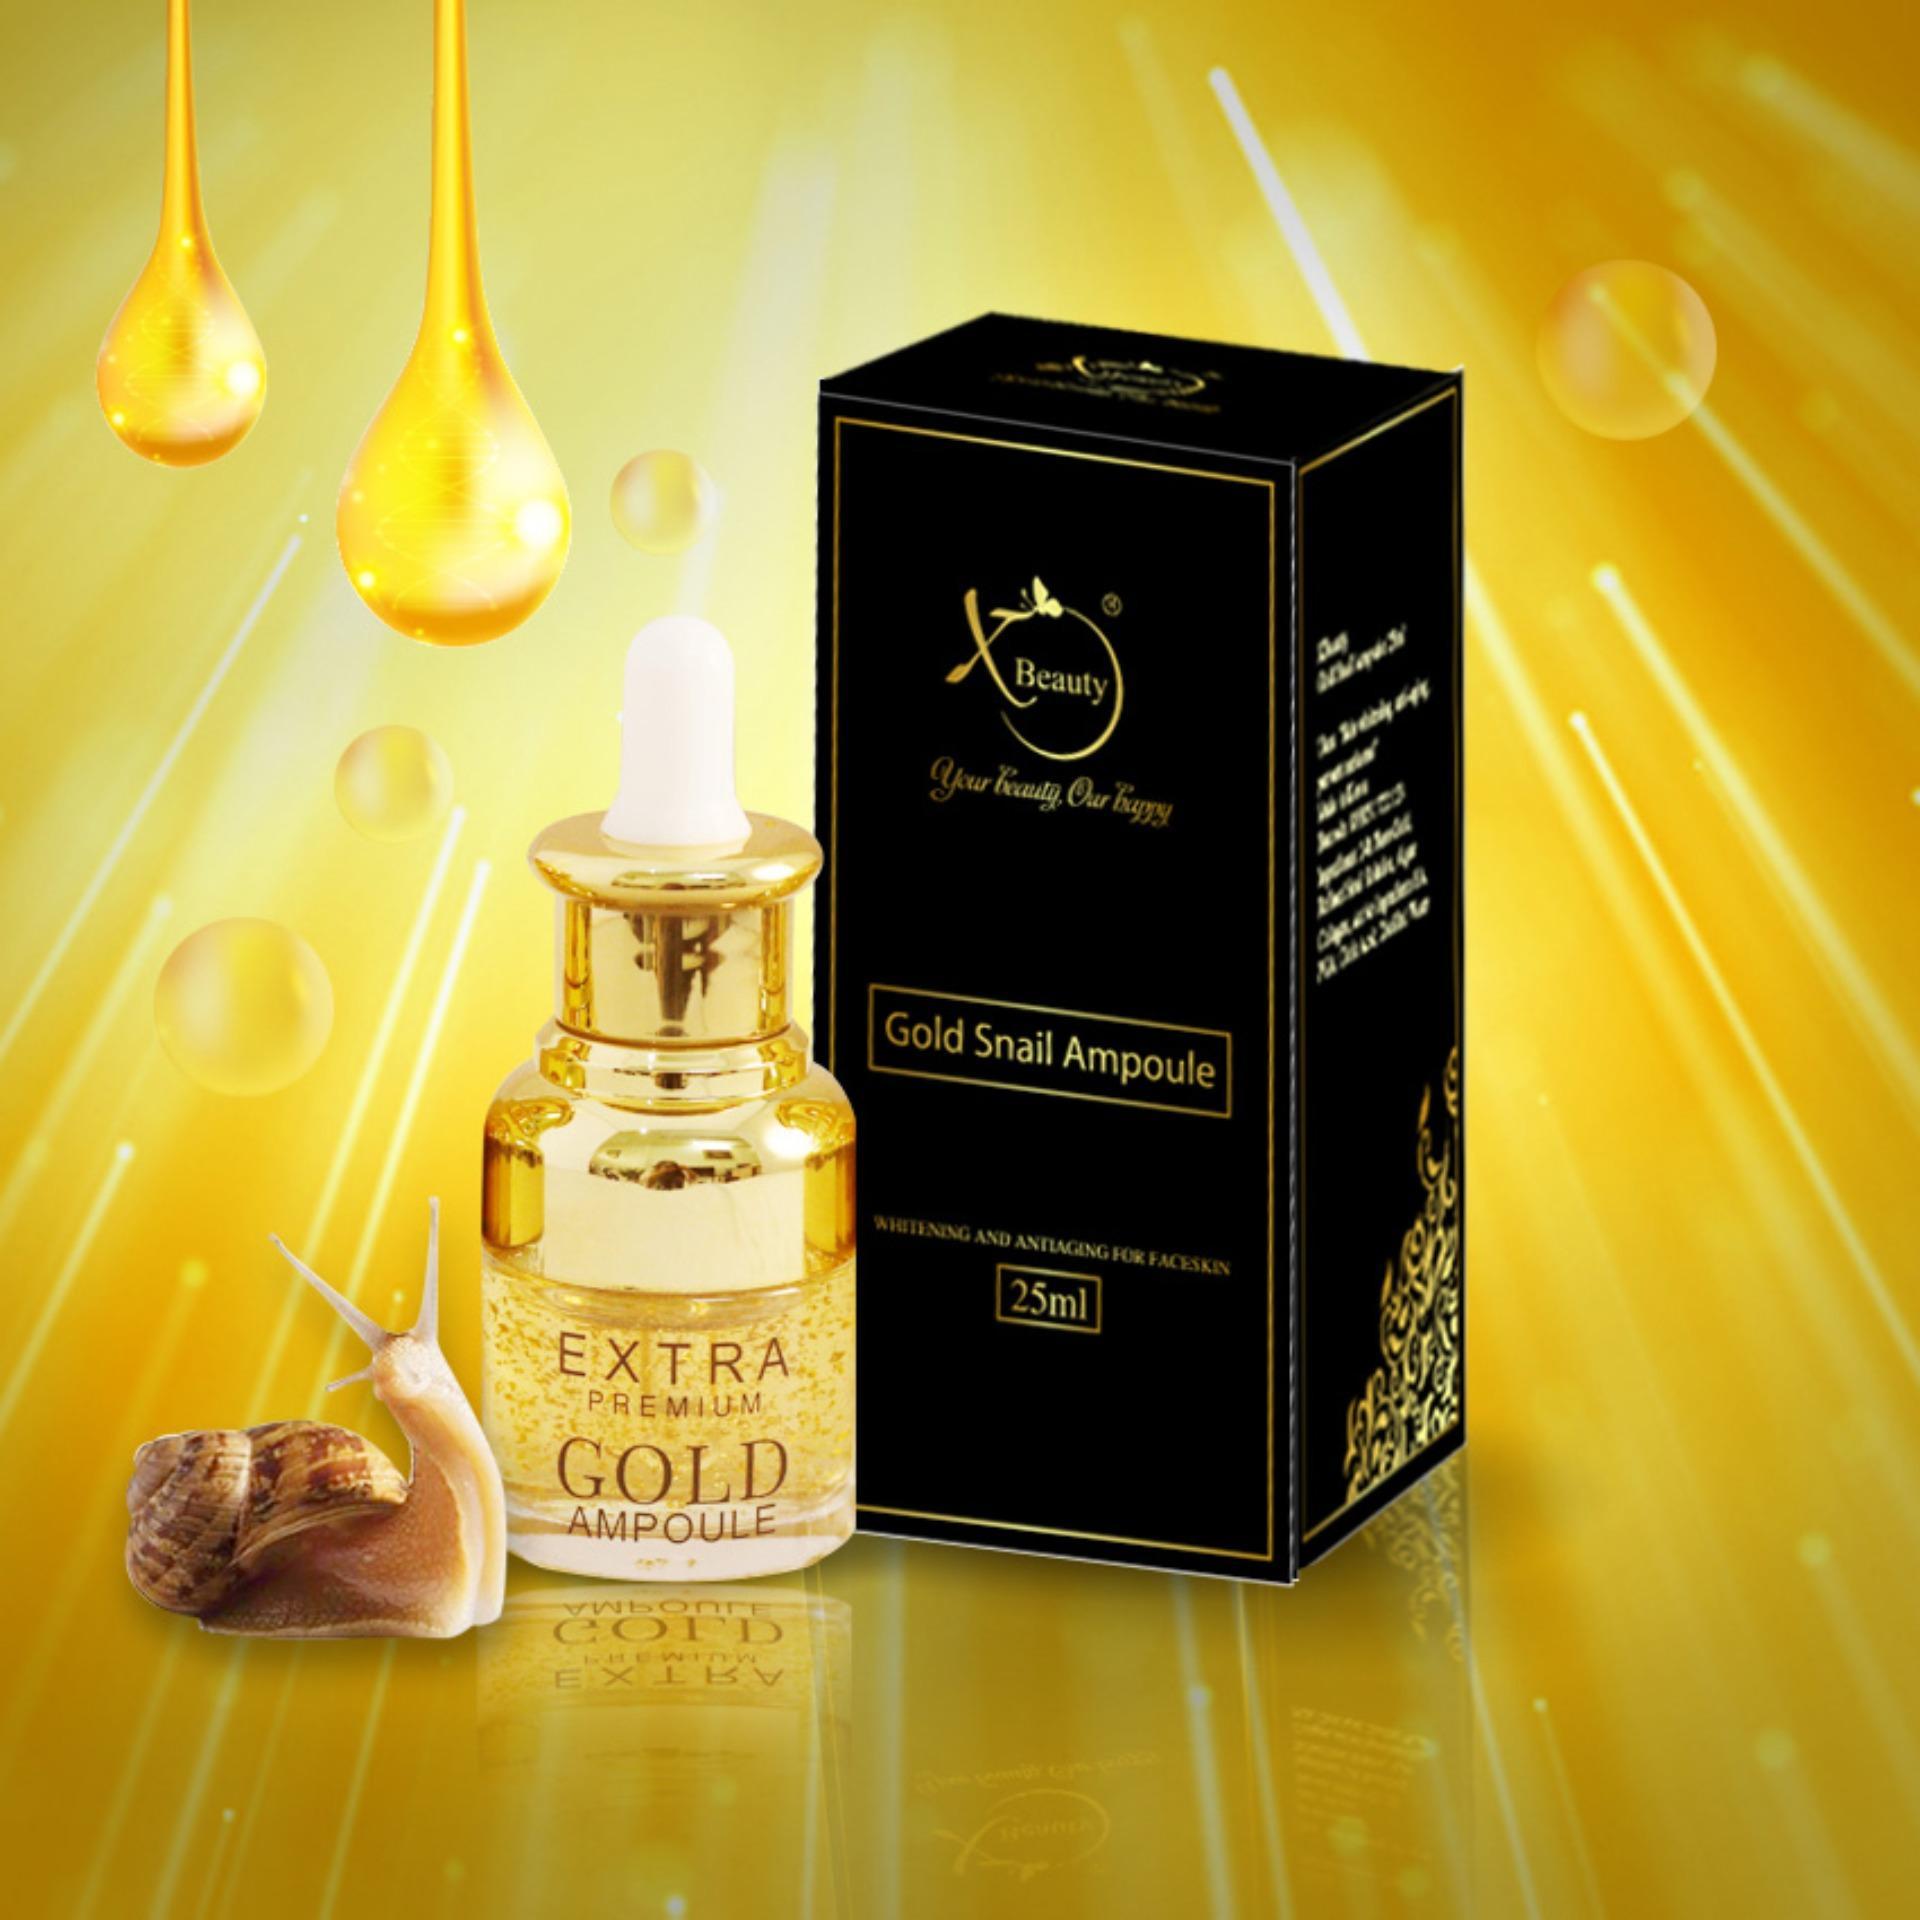 Serum Ốc Sên XBeauty Gold Snail Ampoule 25ml Hàn Quốc - Serum Ốc Sên Gold Perfect skin care chăm sóc da hoàn hảo XBeauty Gold Snail Ampoule 25ml